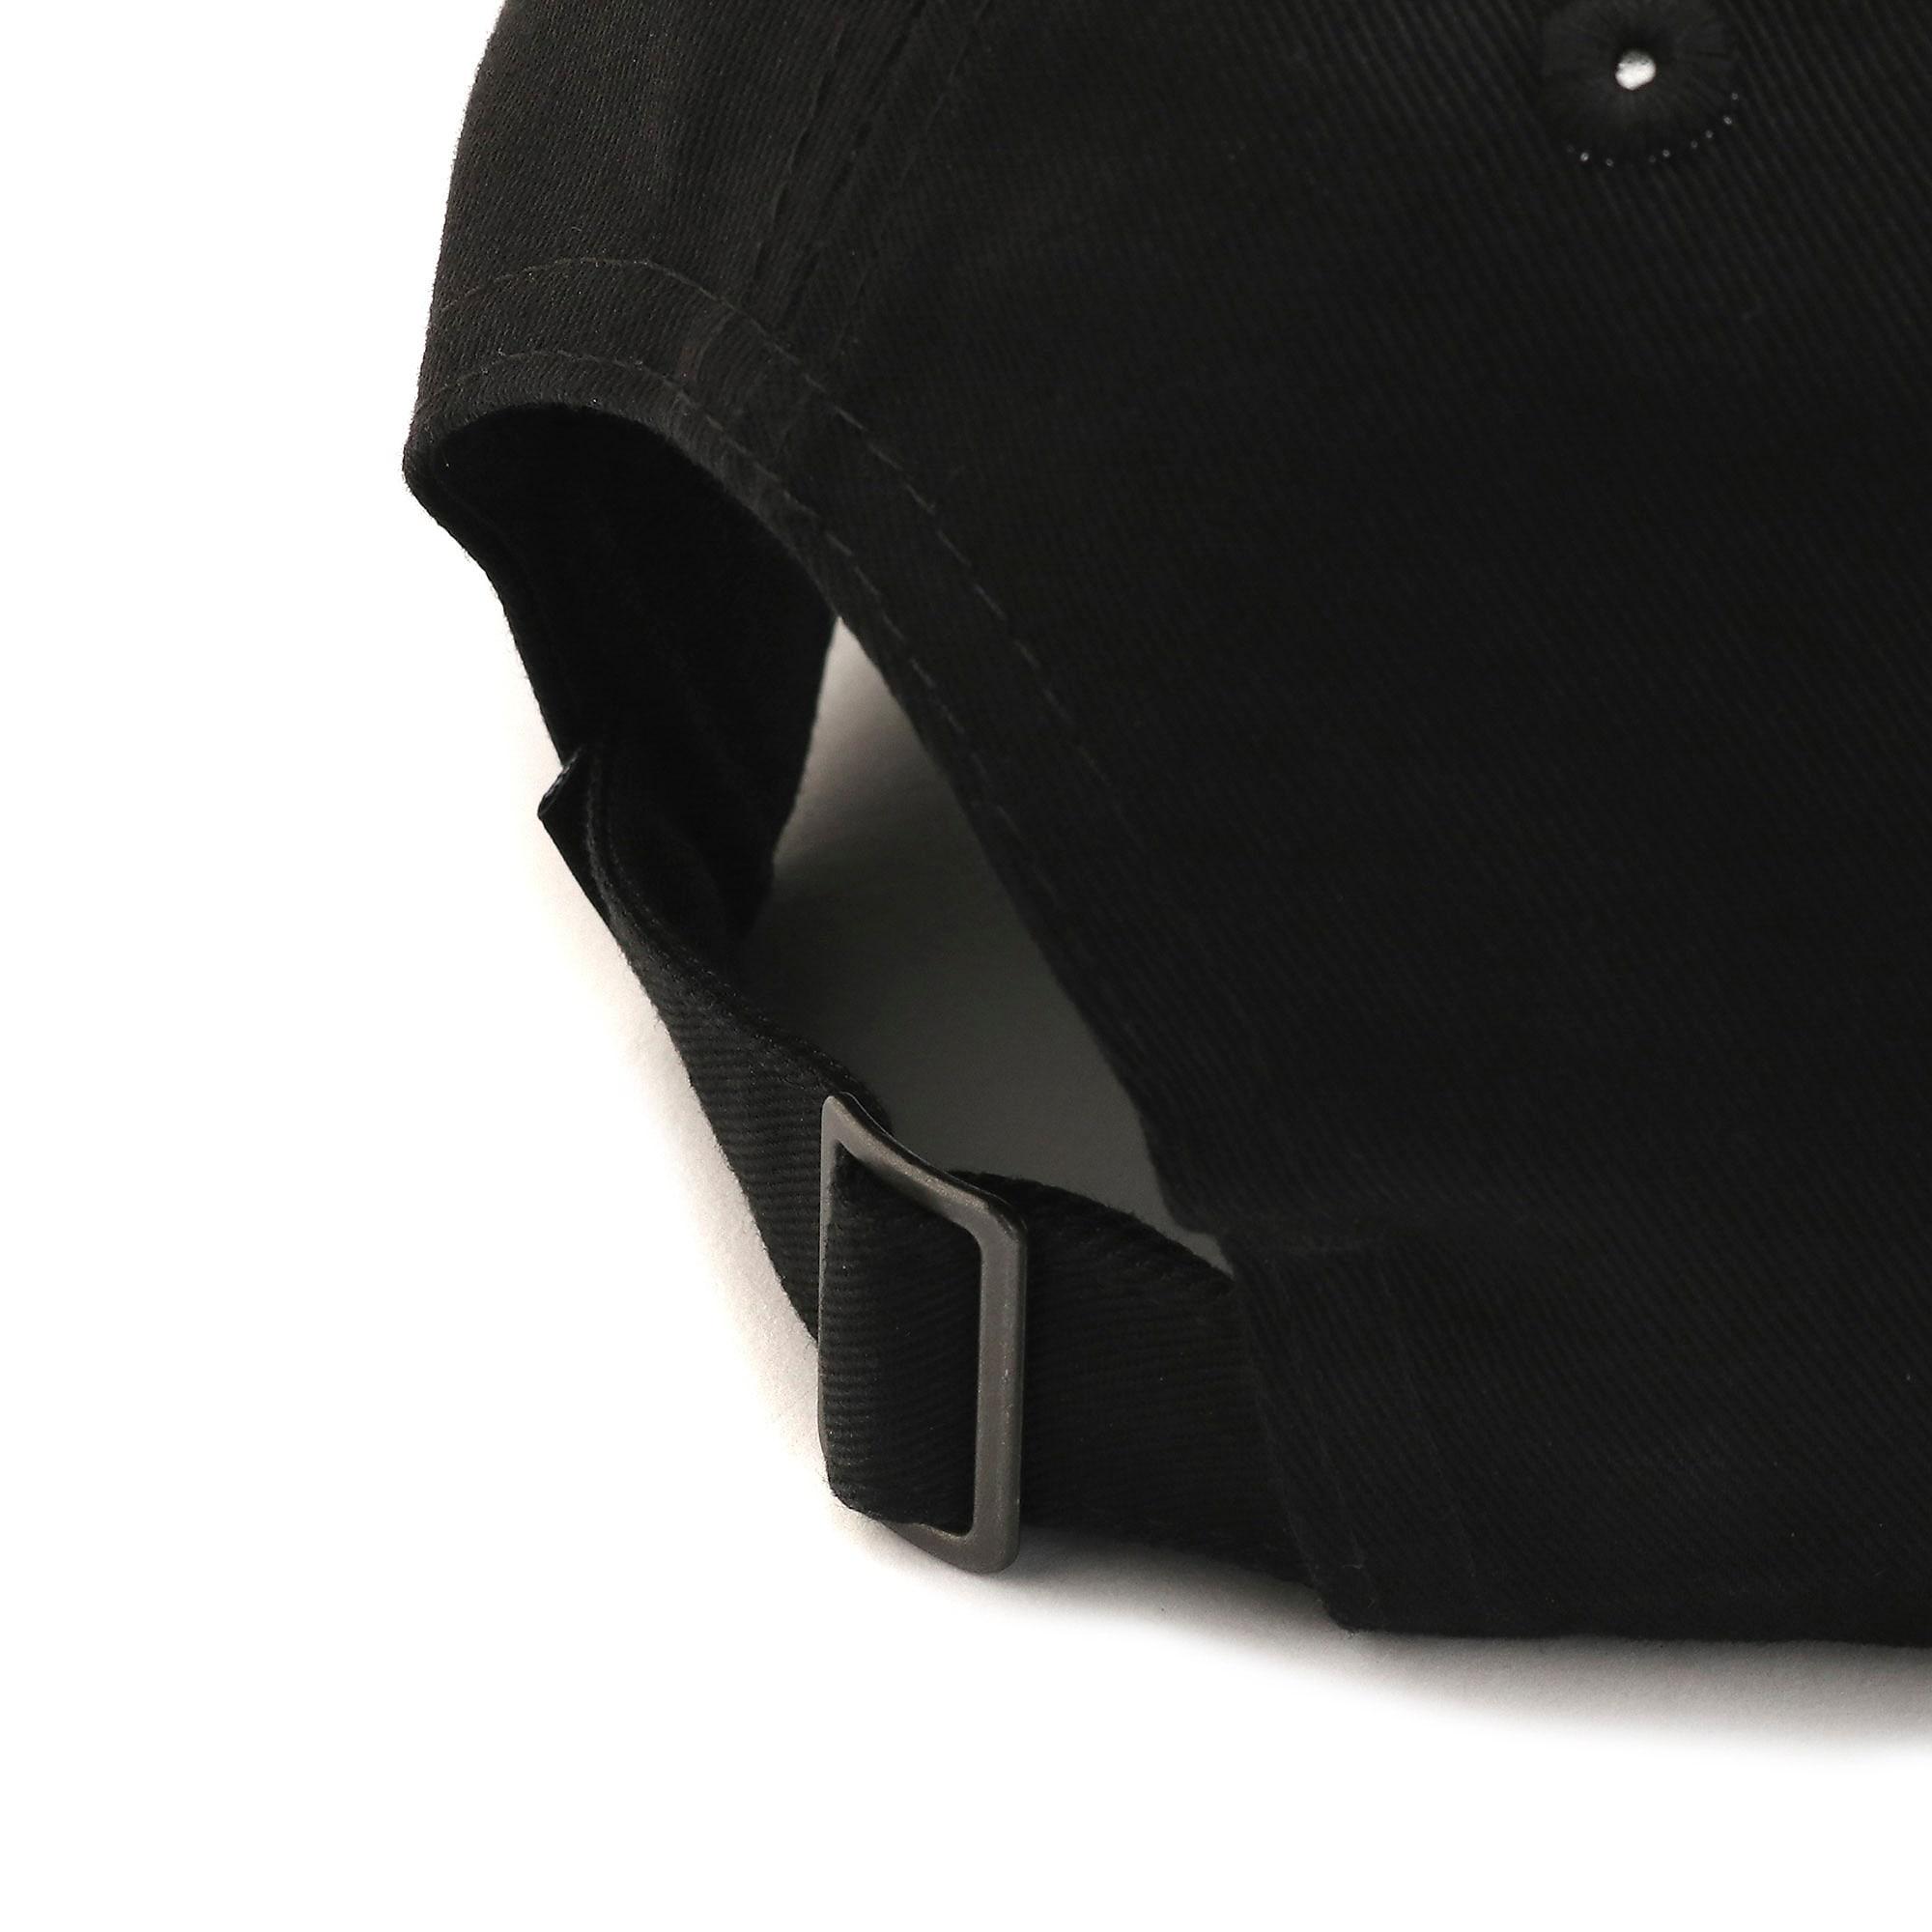 Thumbnail 7 of アーカイブ ロゴ ベースボール キャップ, Puma Black, medium-JPN